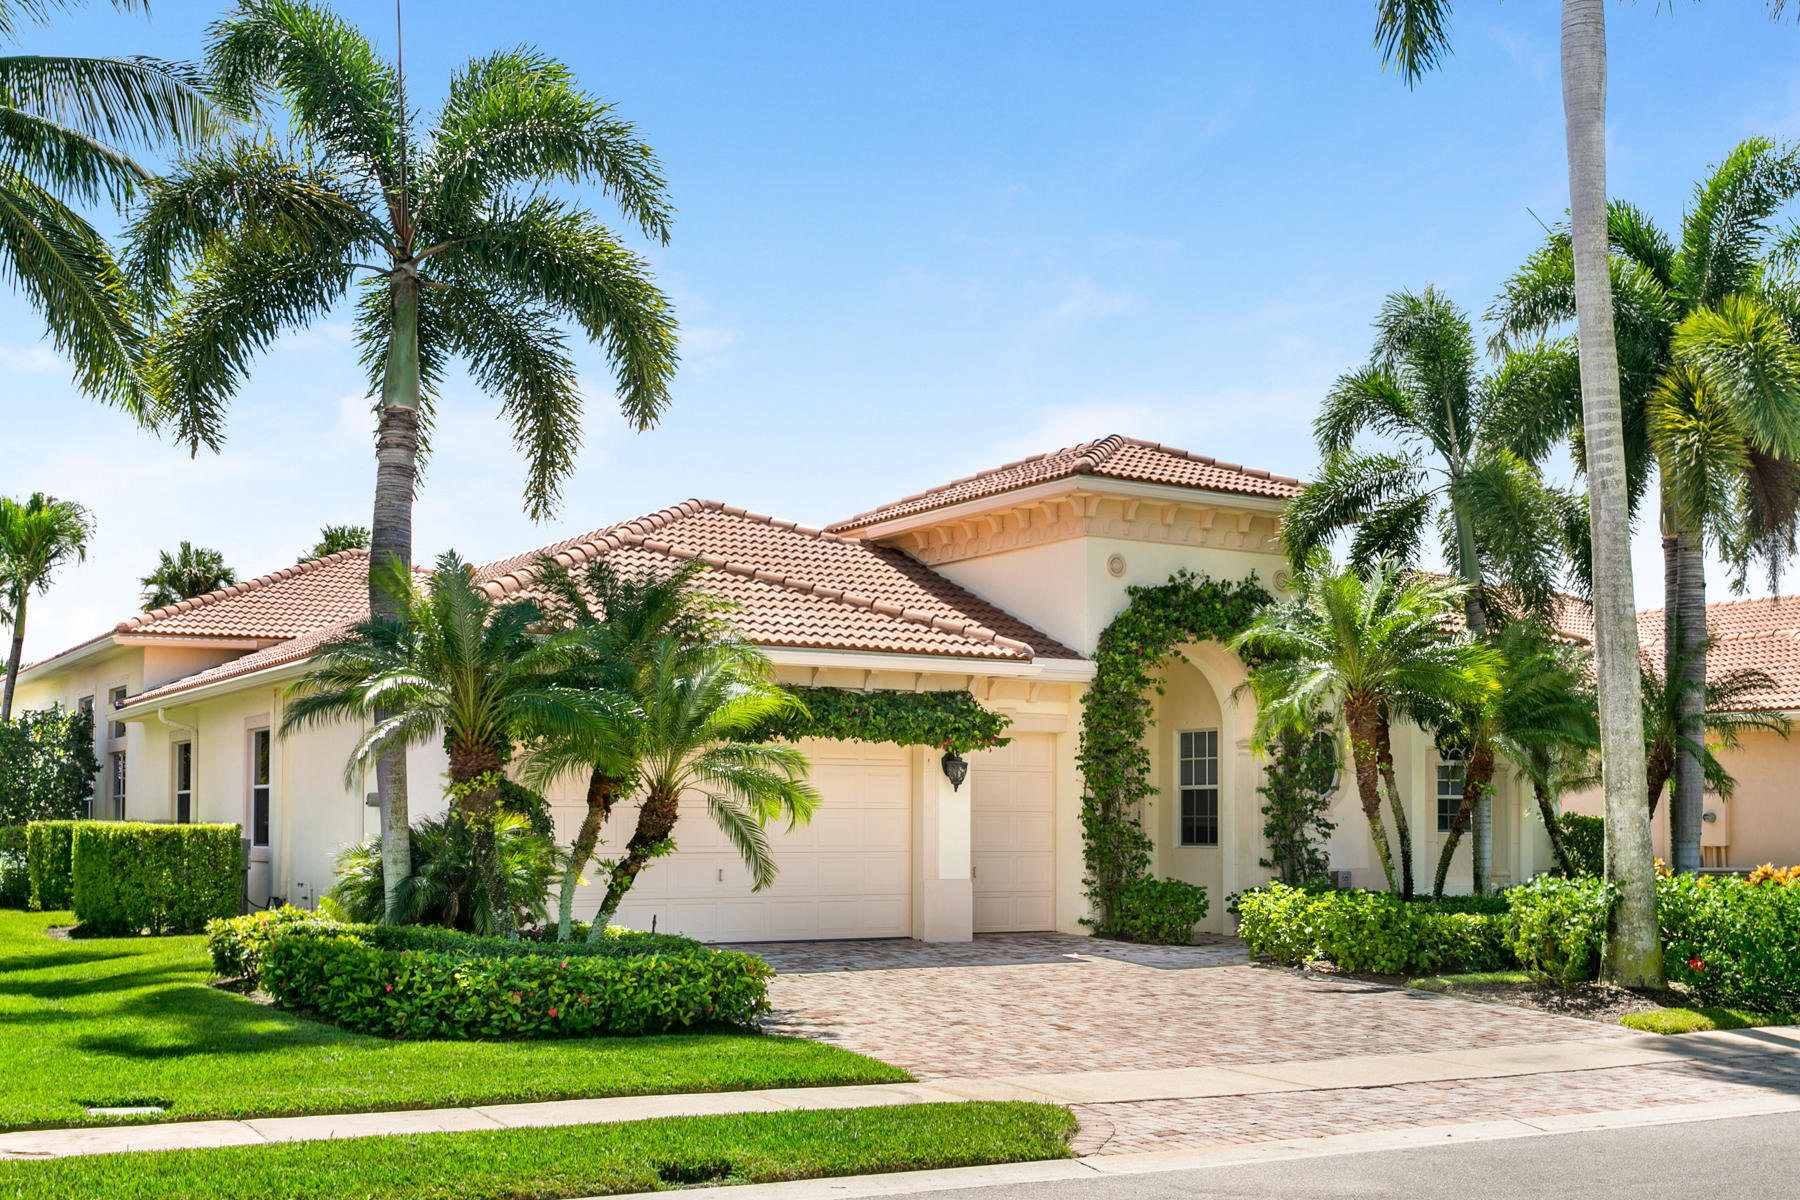 530 Les Jardin Drive, Palm Beach Gardens, Florida 33410, 4 Bedrooms Bedrooms, ,4.1 BathroomsBathrooms,A,Single family,Les Jardin,RX-10687748